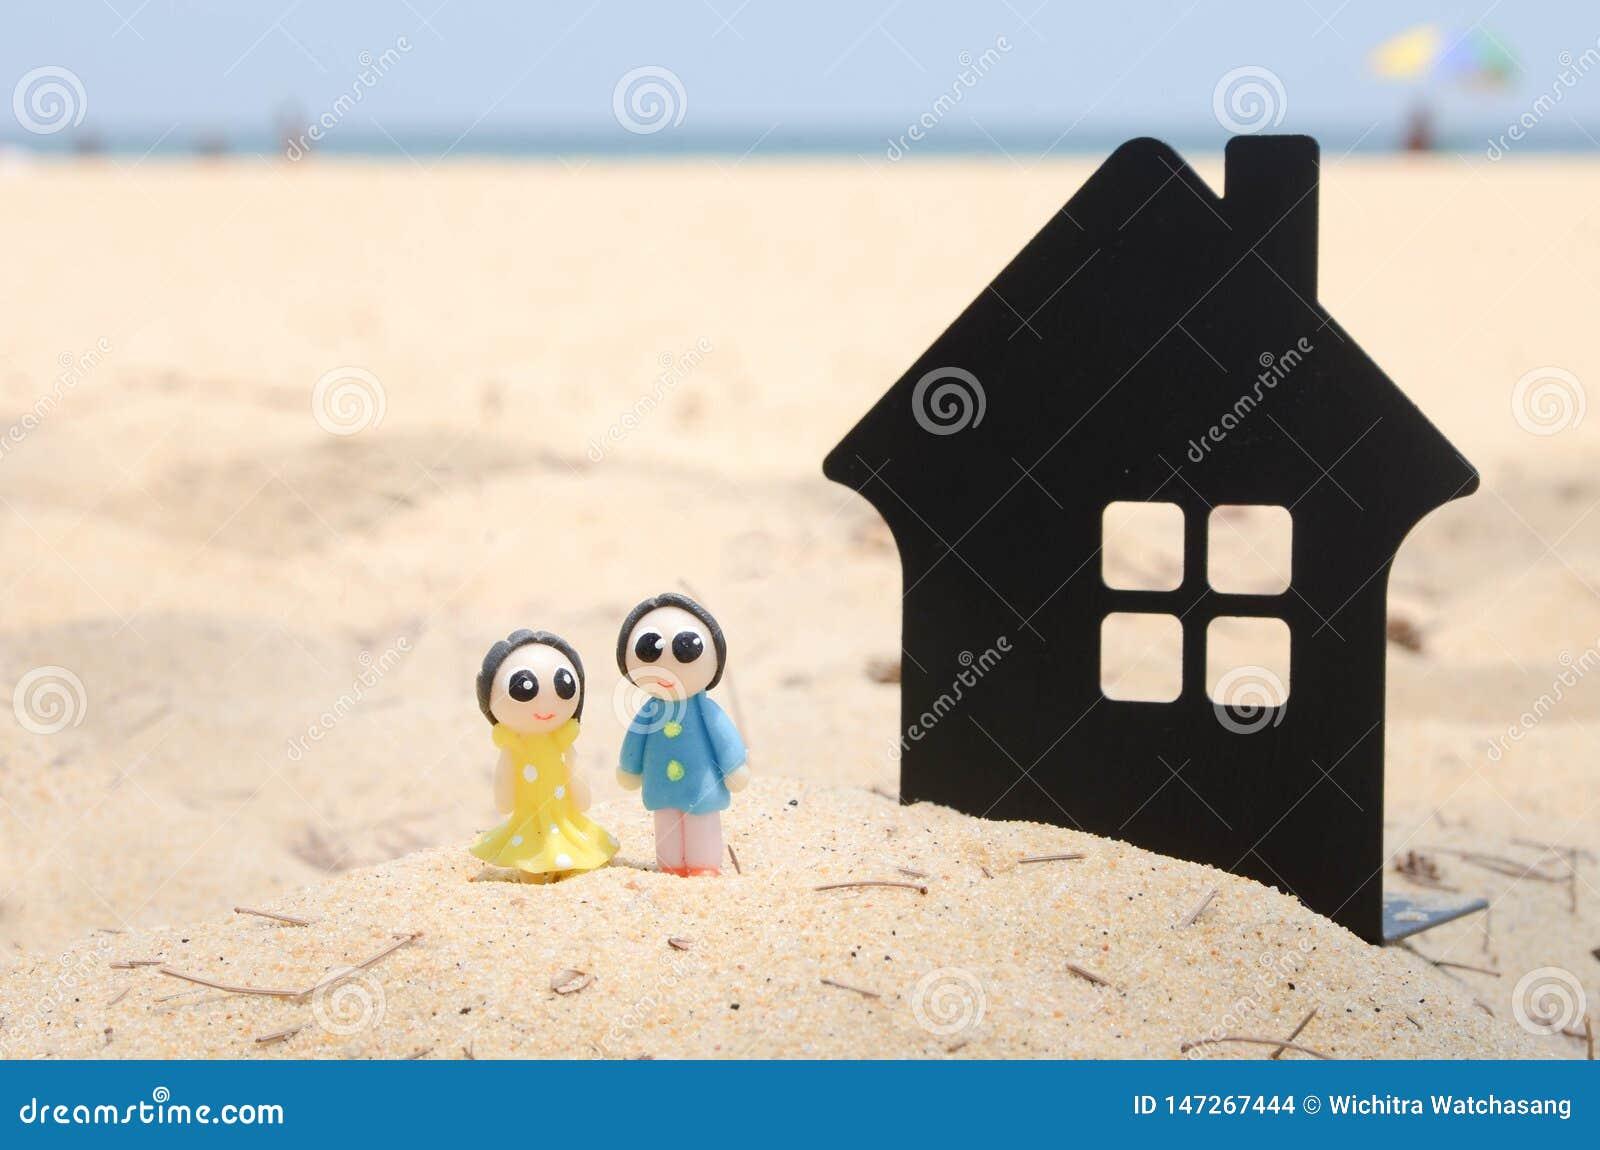 miniature couple and miniature house on the beautiful beach